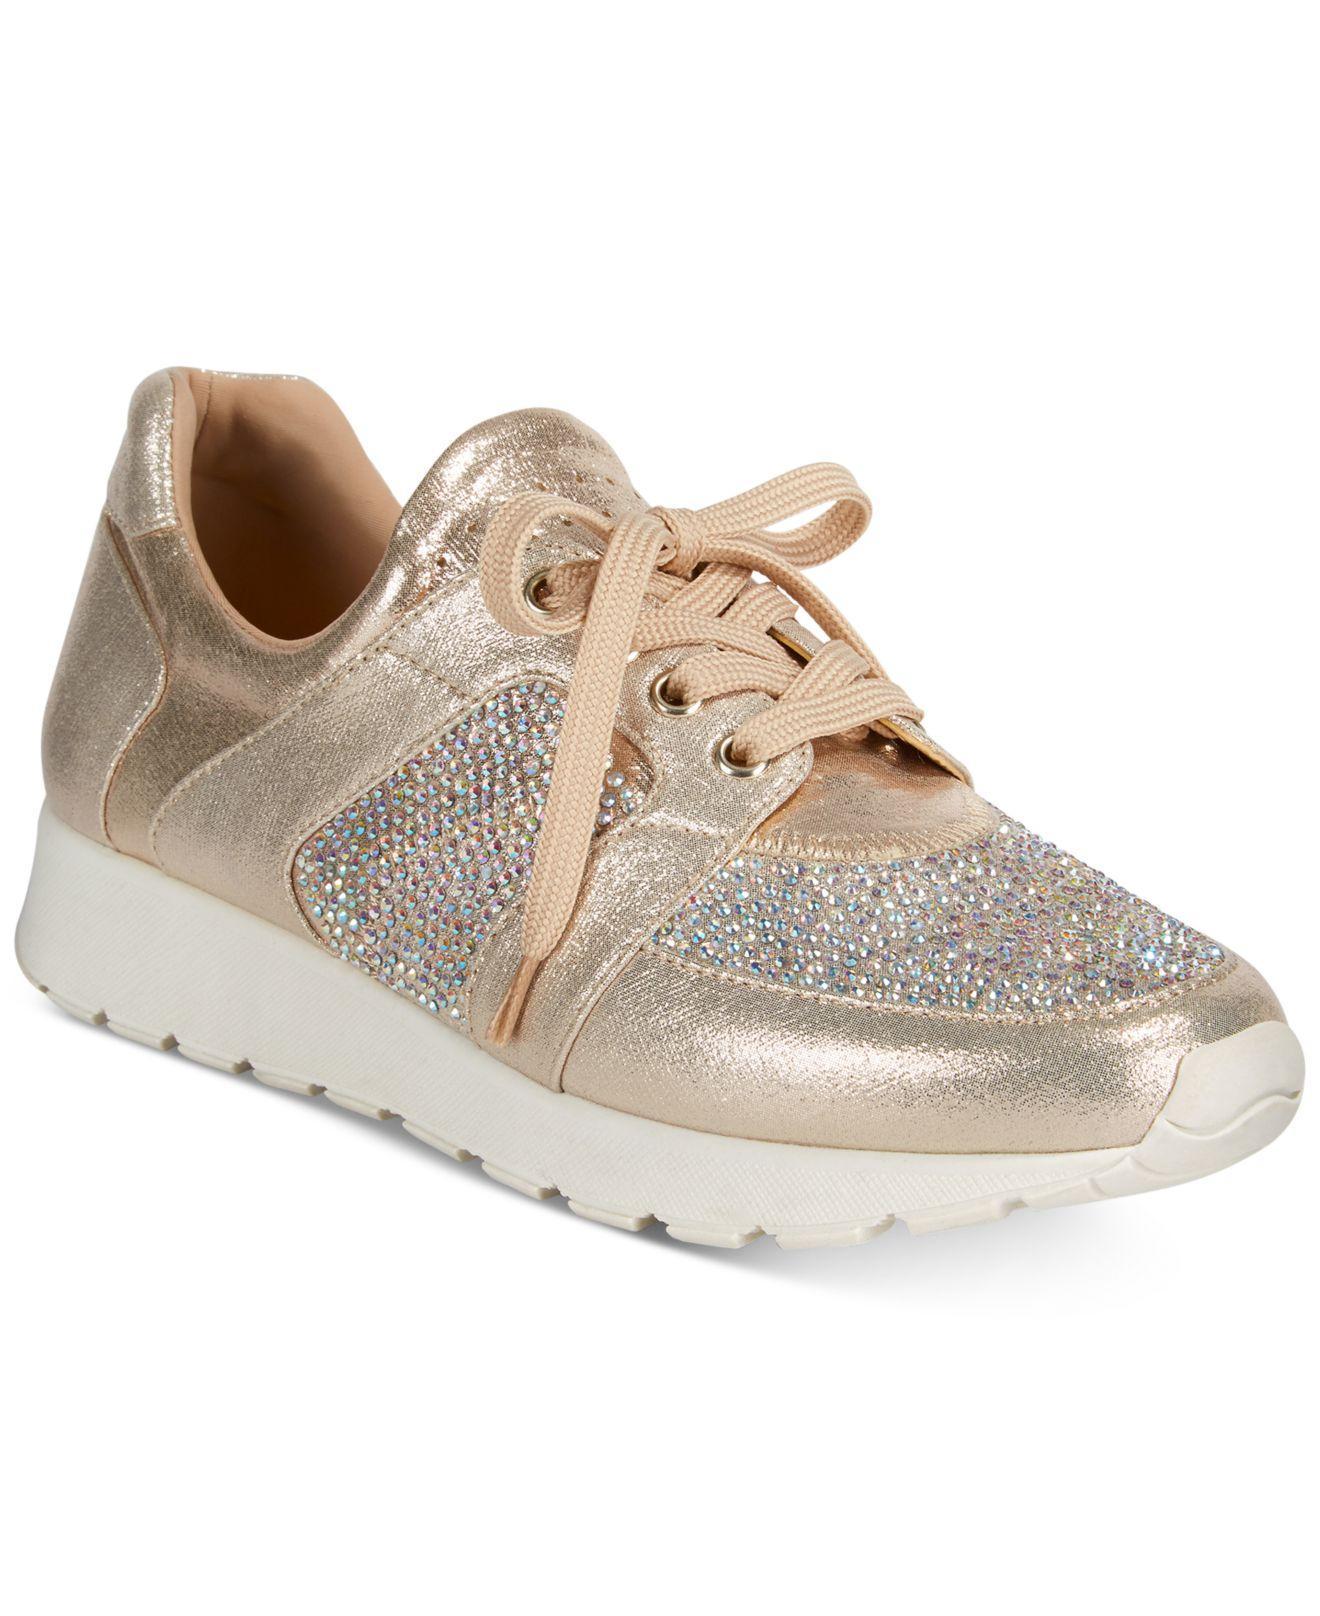 b3397c195b5 Lyst - Inc International Concepts Pakiss Embellished Sneakers